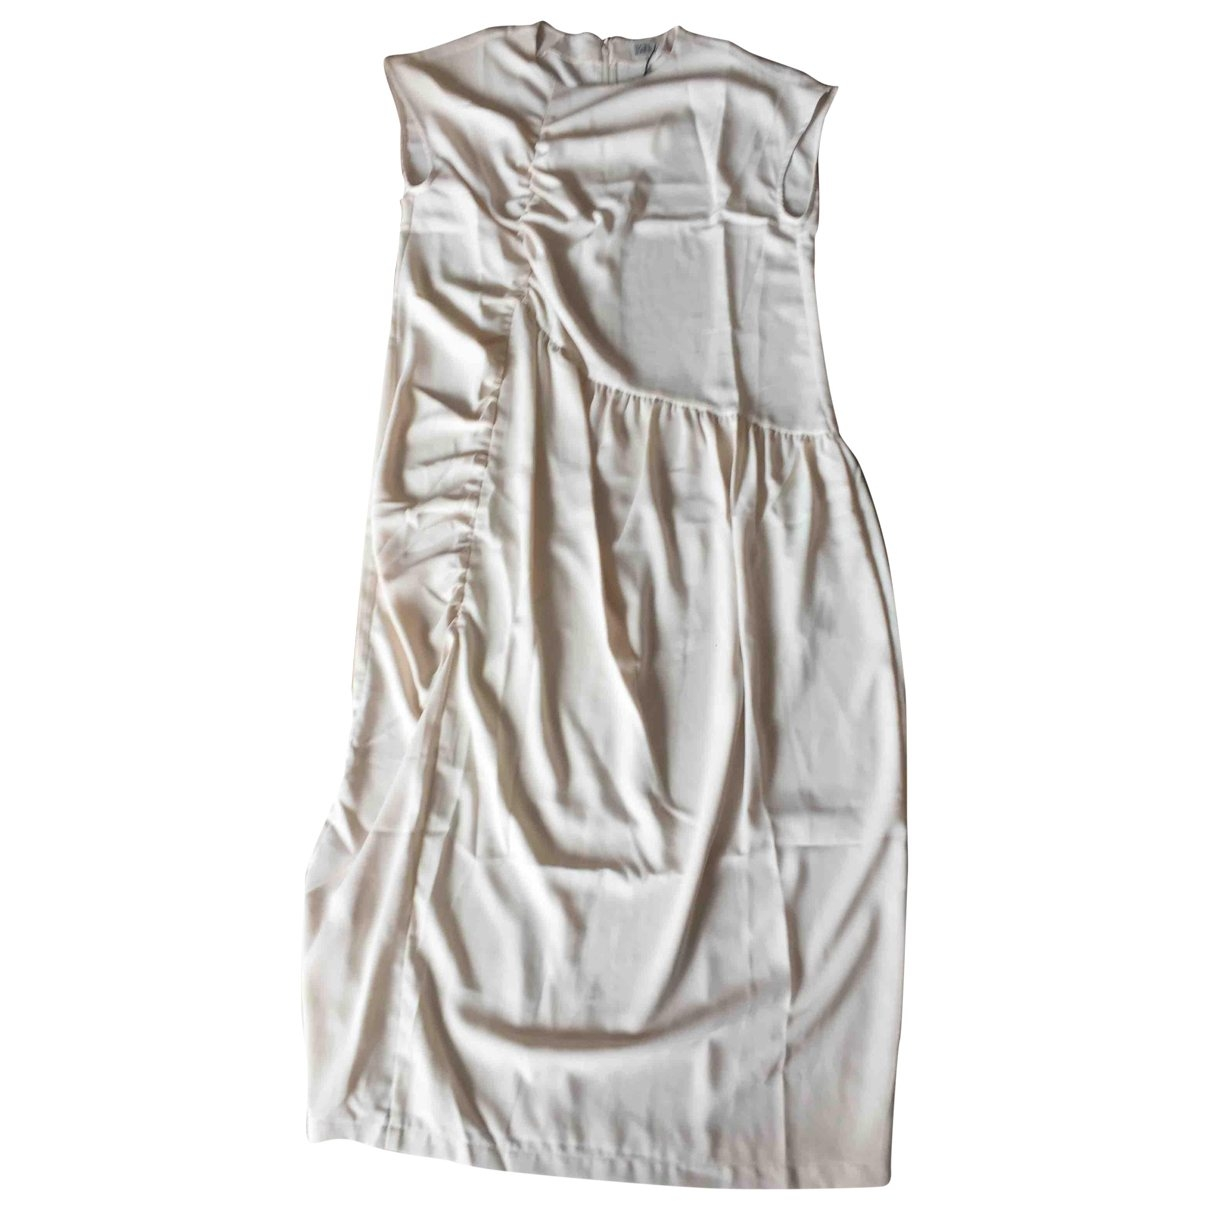 Totême \N Ecru dress for Women S International